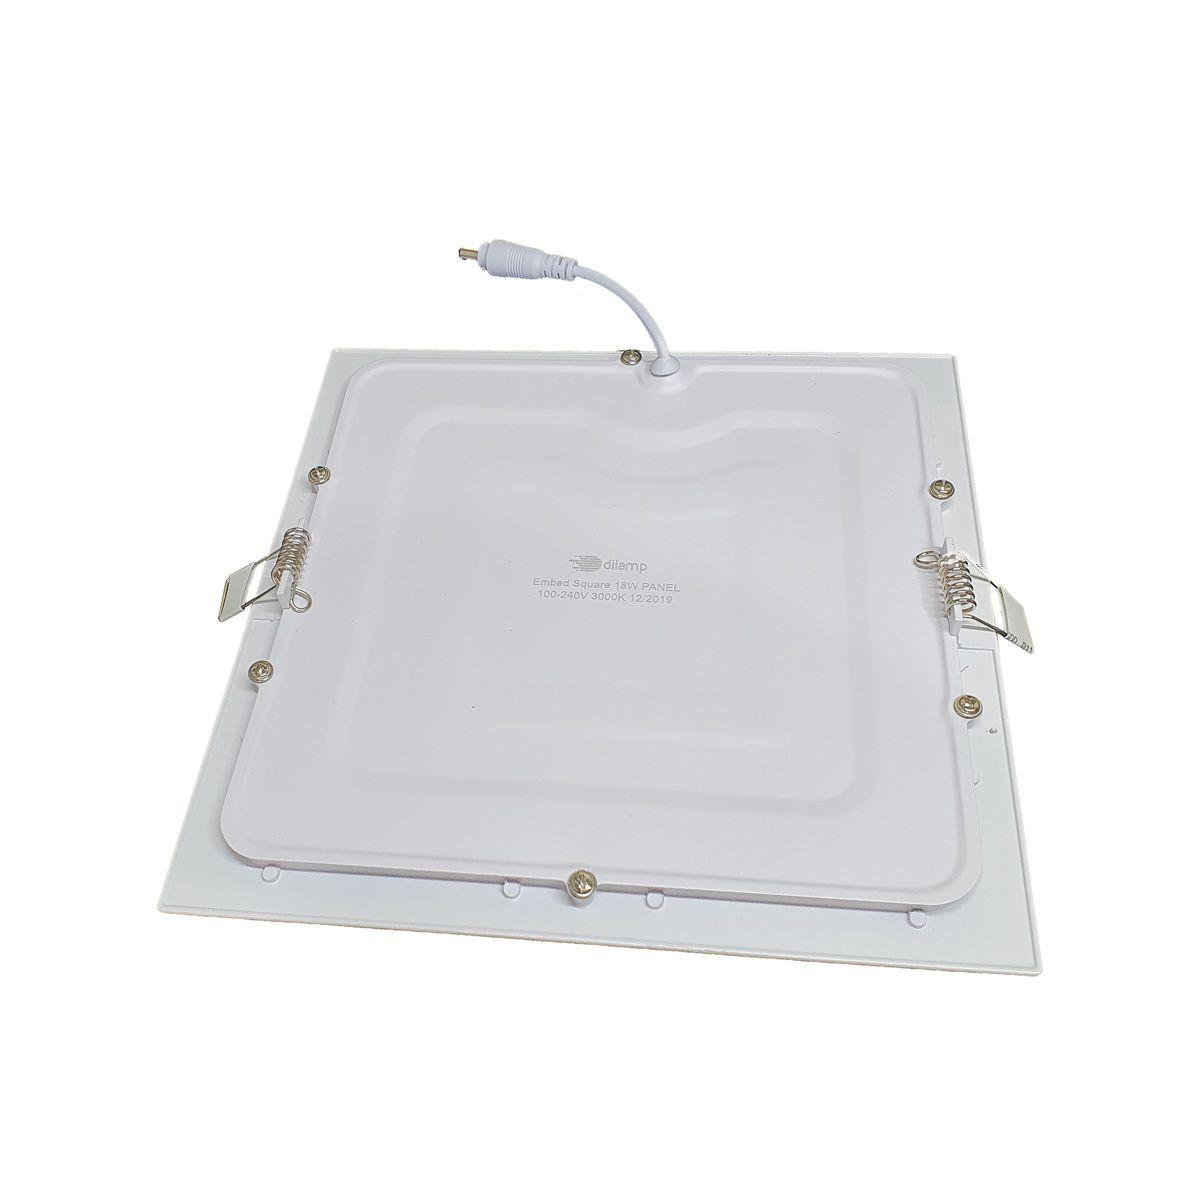 KIT 5 Painel Plafon LED 18W Quadrado Luz Branca Fria de Embutir